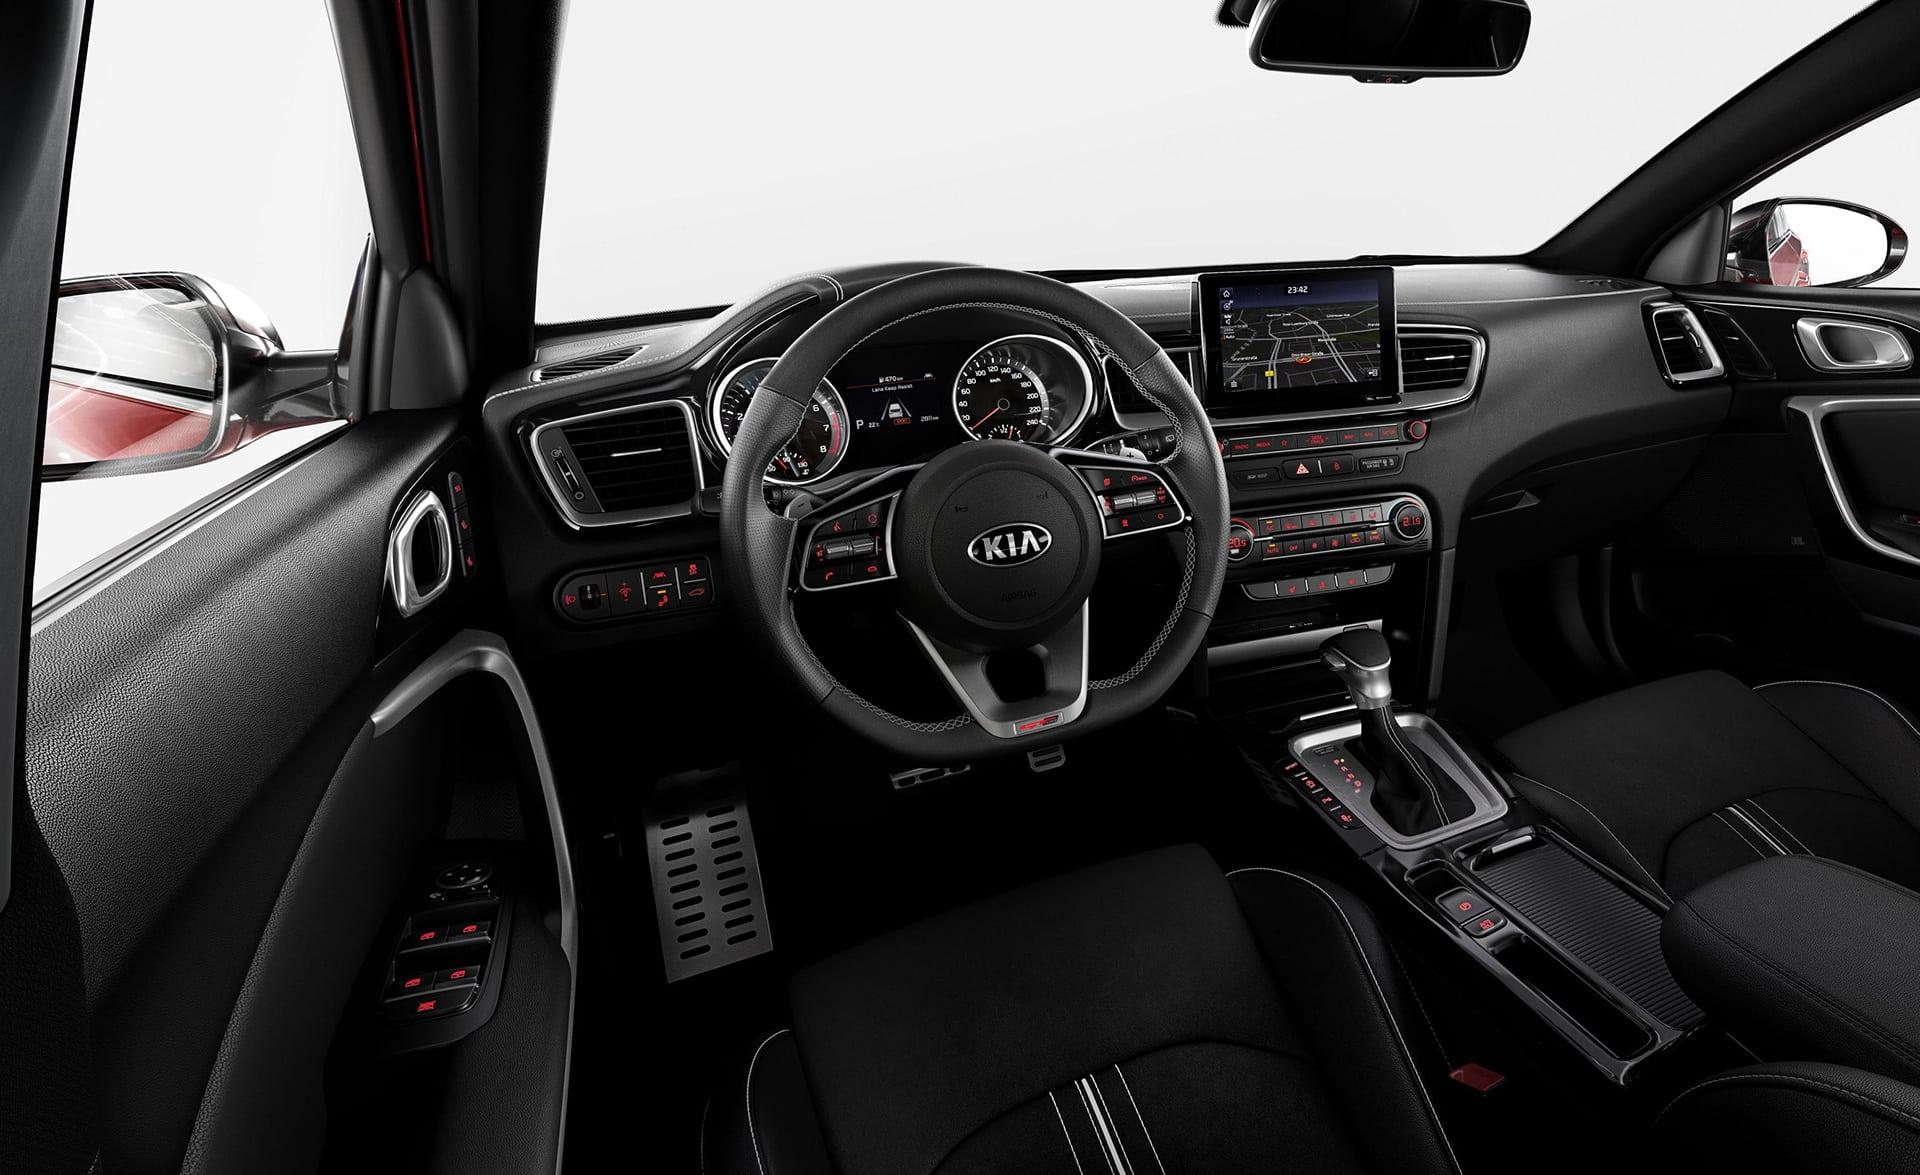 Kia ProCeed The Car Expert